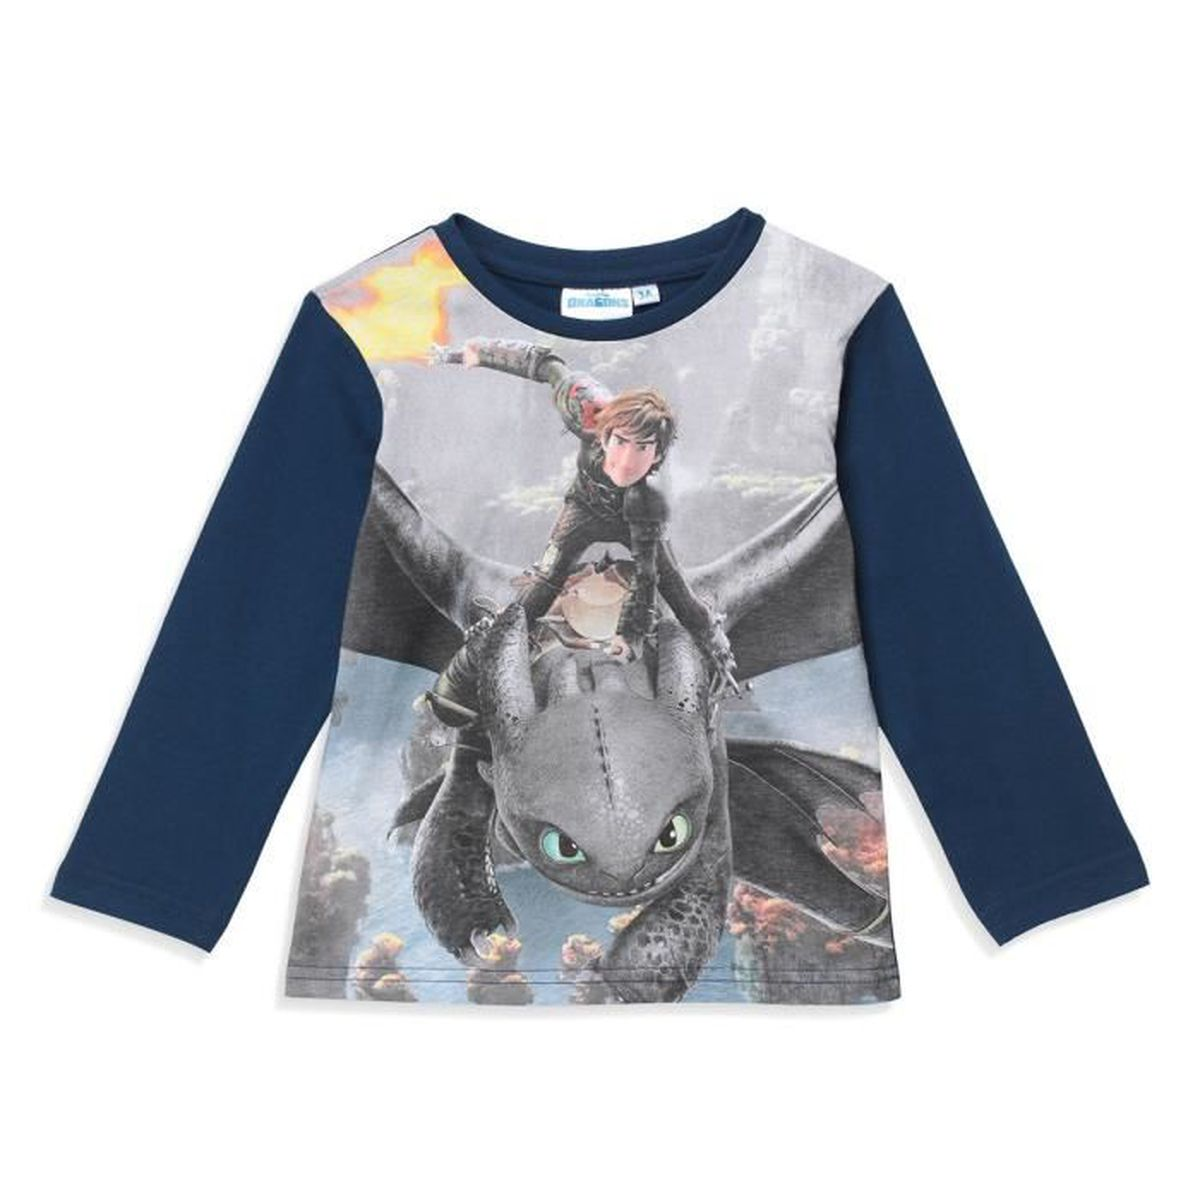 T-SHIRT DRAGONS 3 - T-shirt Manches longues - Marine - Gar